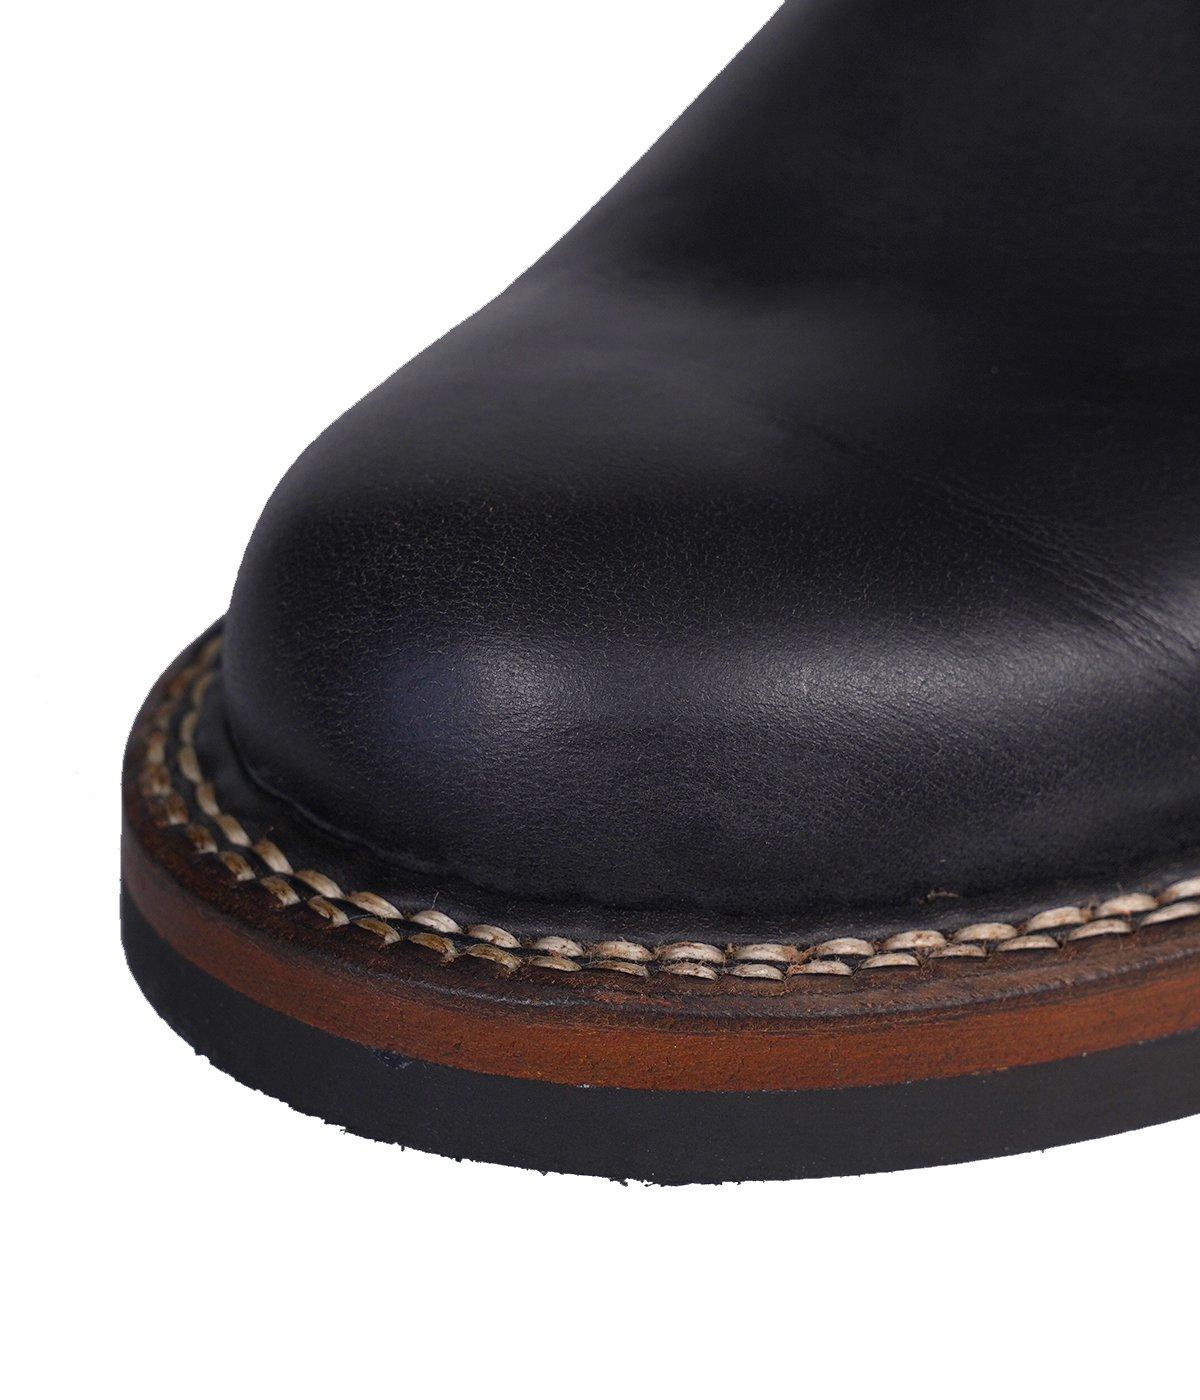 SEMI DRESS CHROMEXCEL(ブラッククロムエキセル/ハトメ:カッパー )